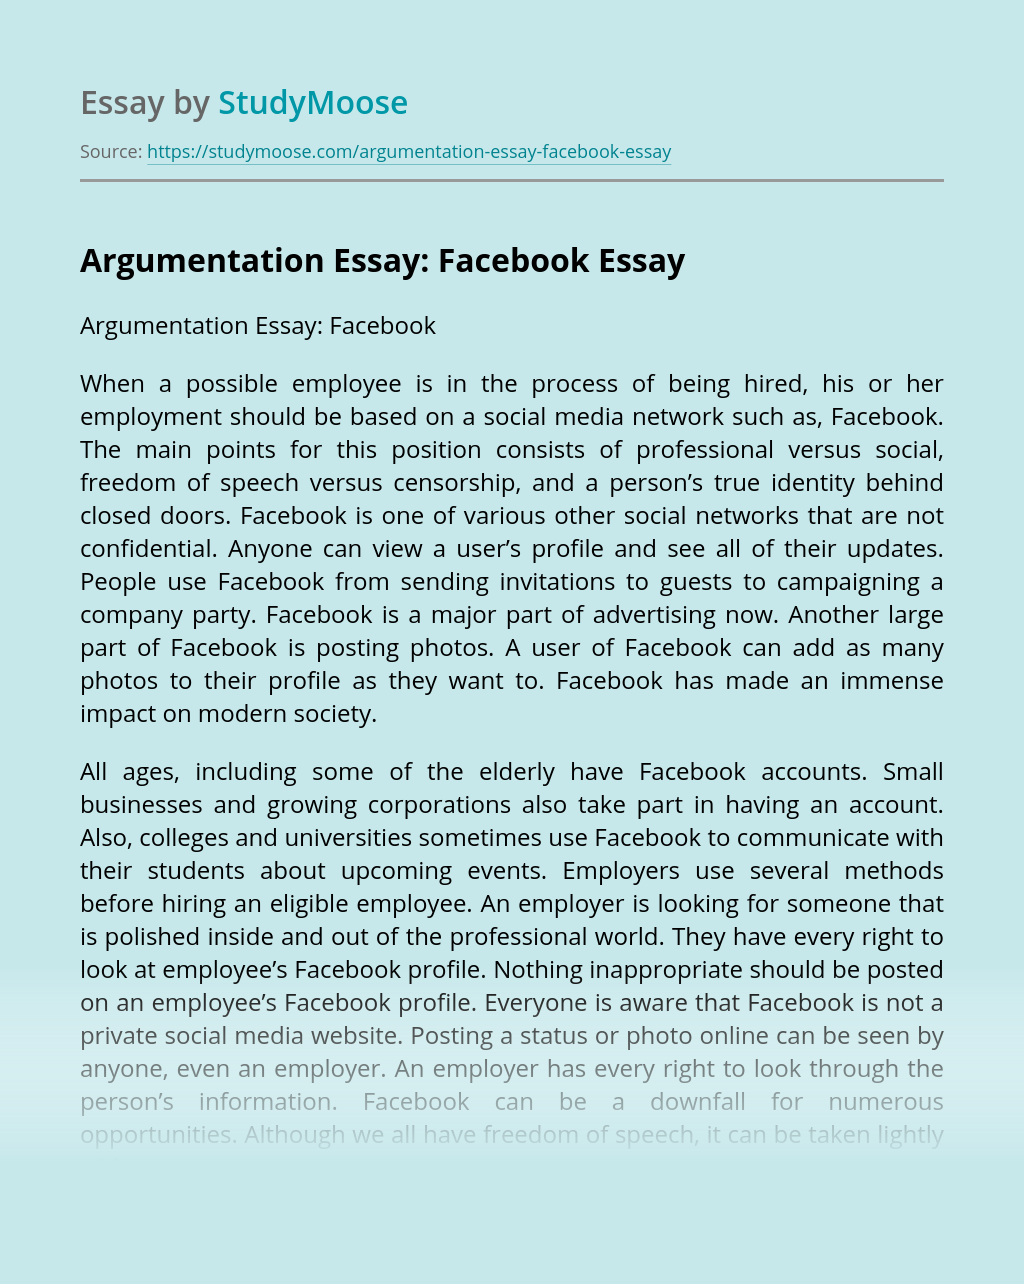 Argumentation Essay: Facebook